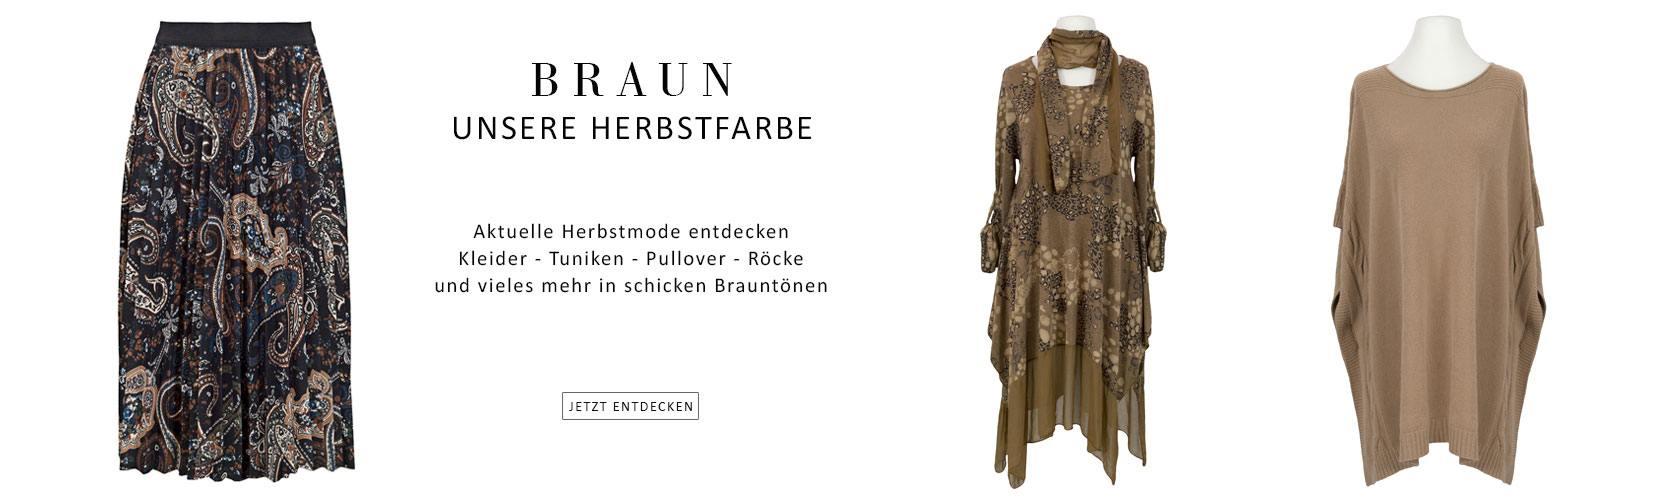 Mode in Herbstfarben braun - Italienische Damenmode